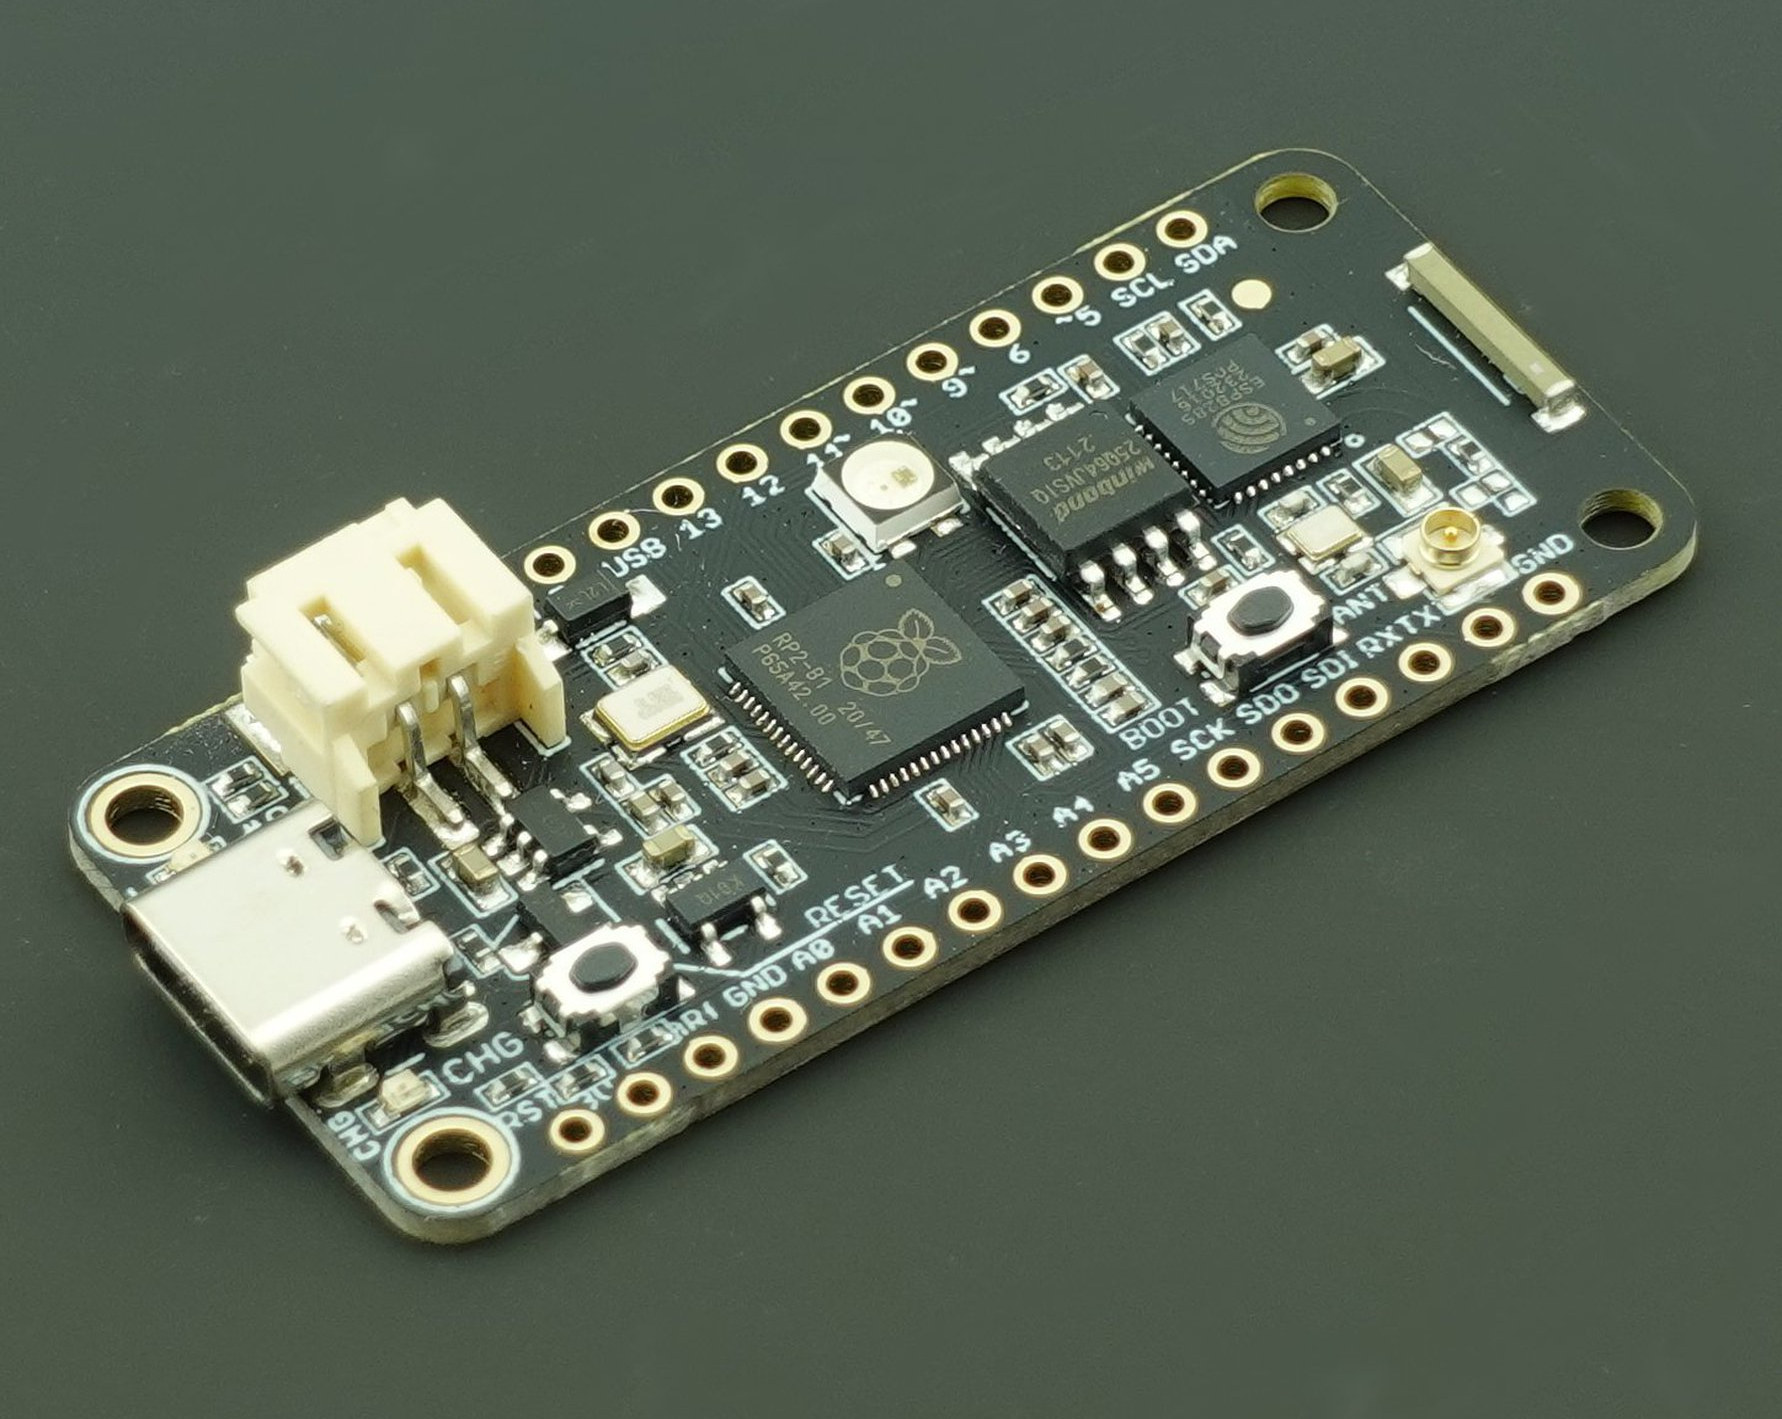 Challenger RP2040 WiFi board